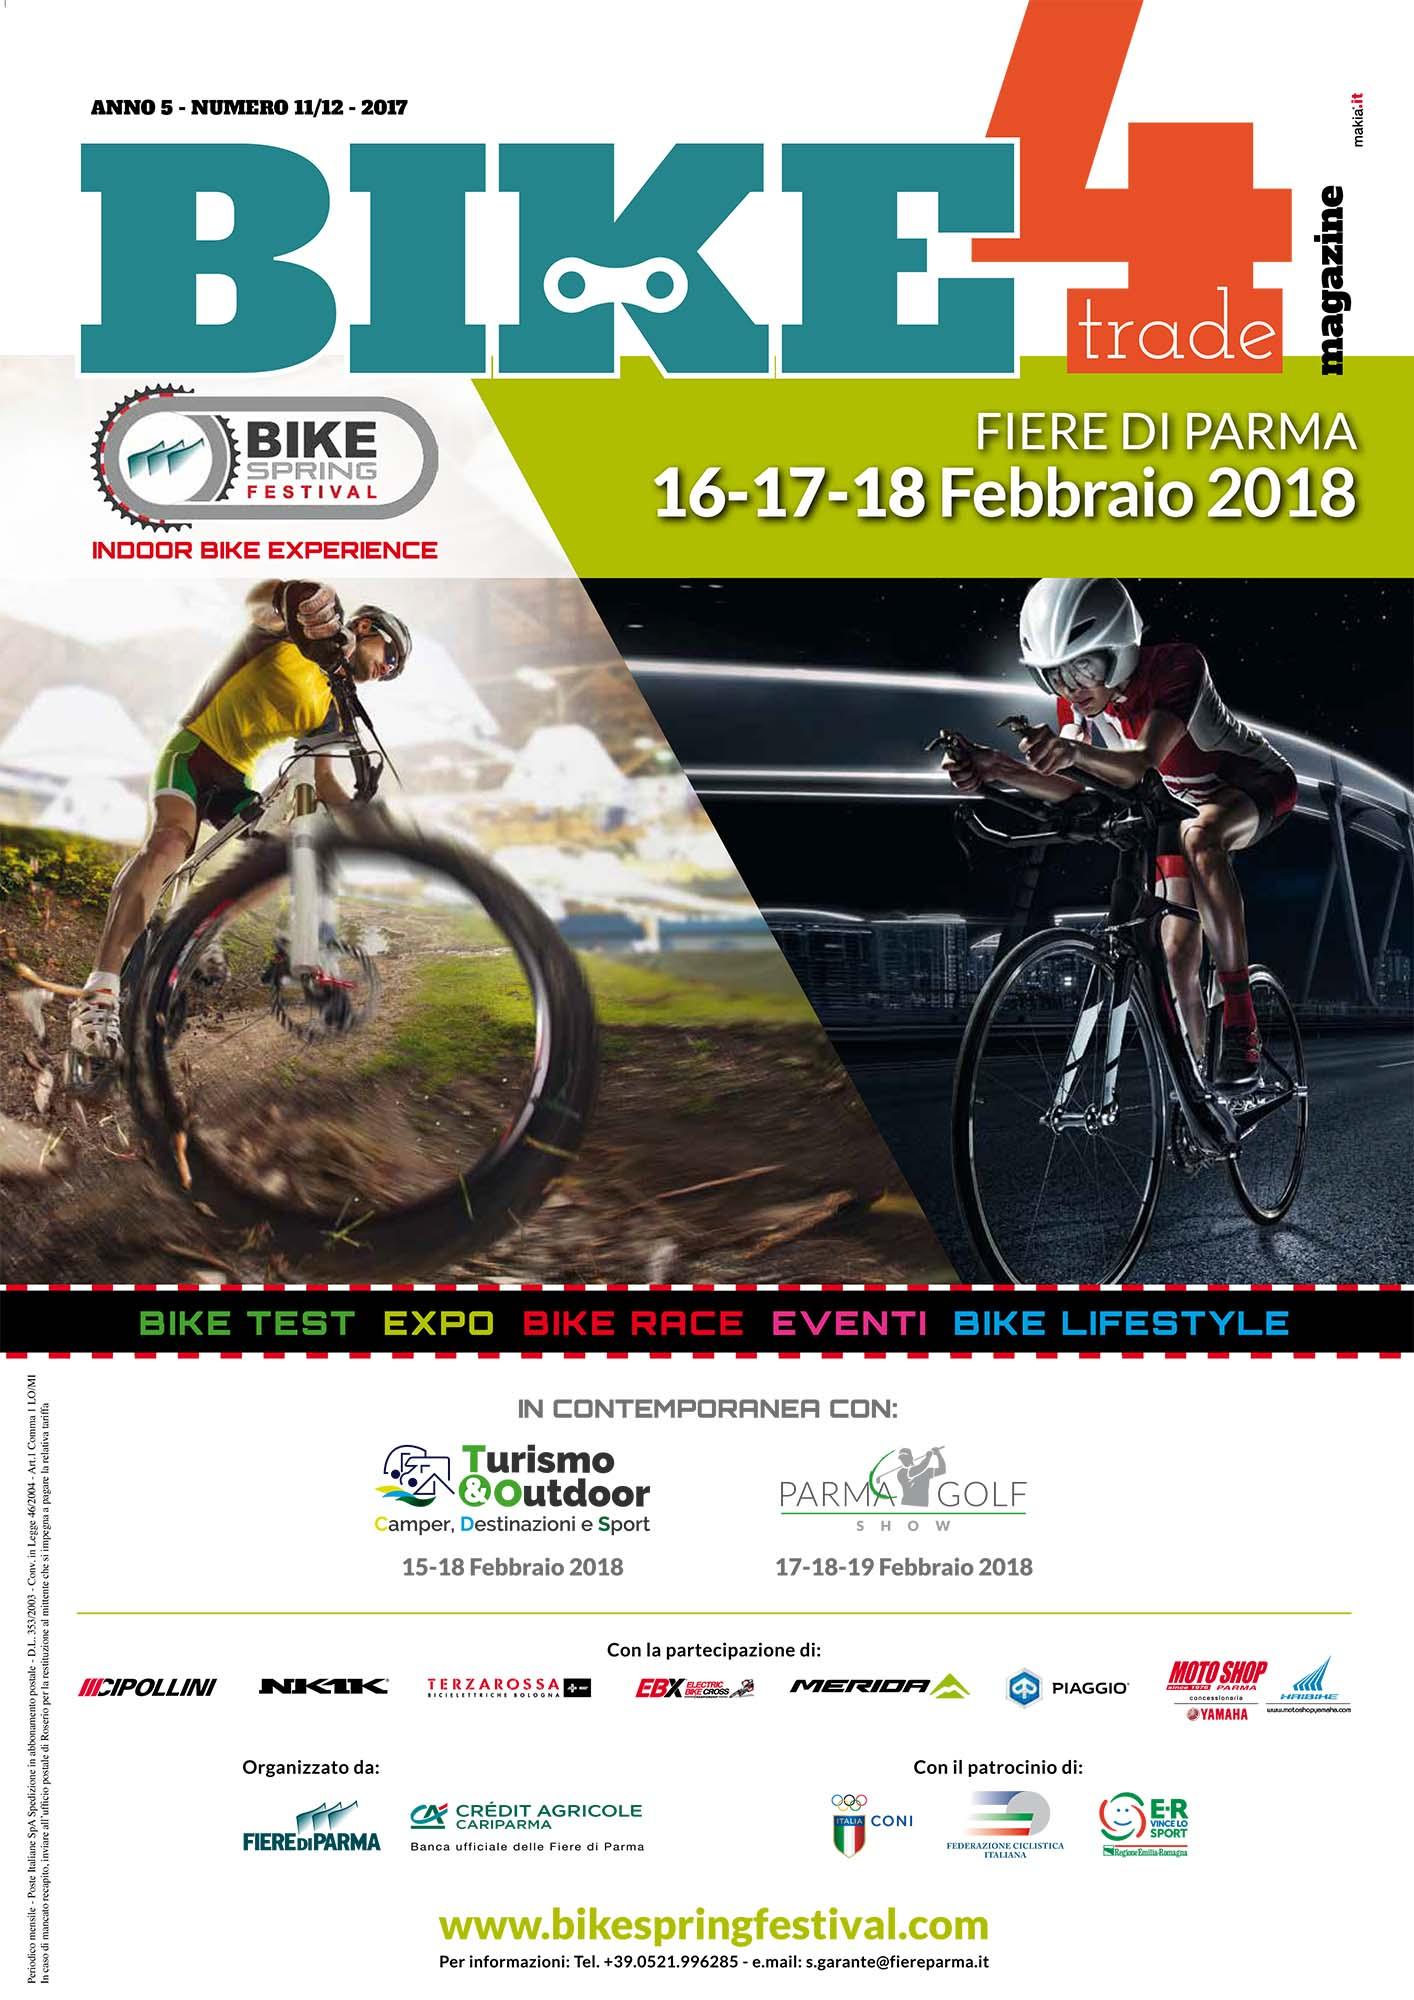 Bike4Trade 11/12_2017